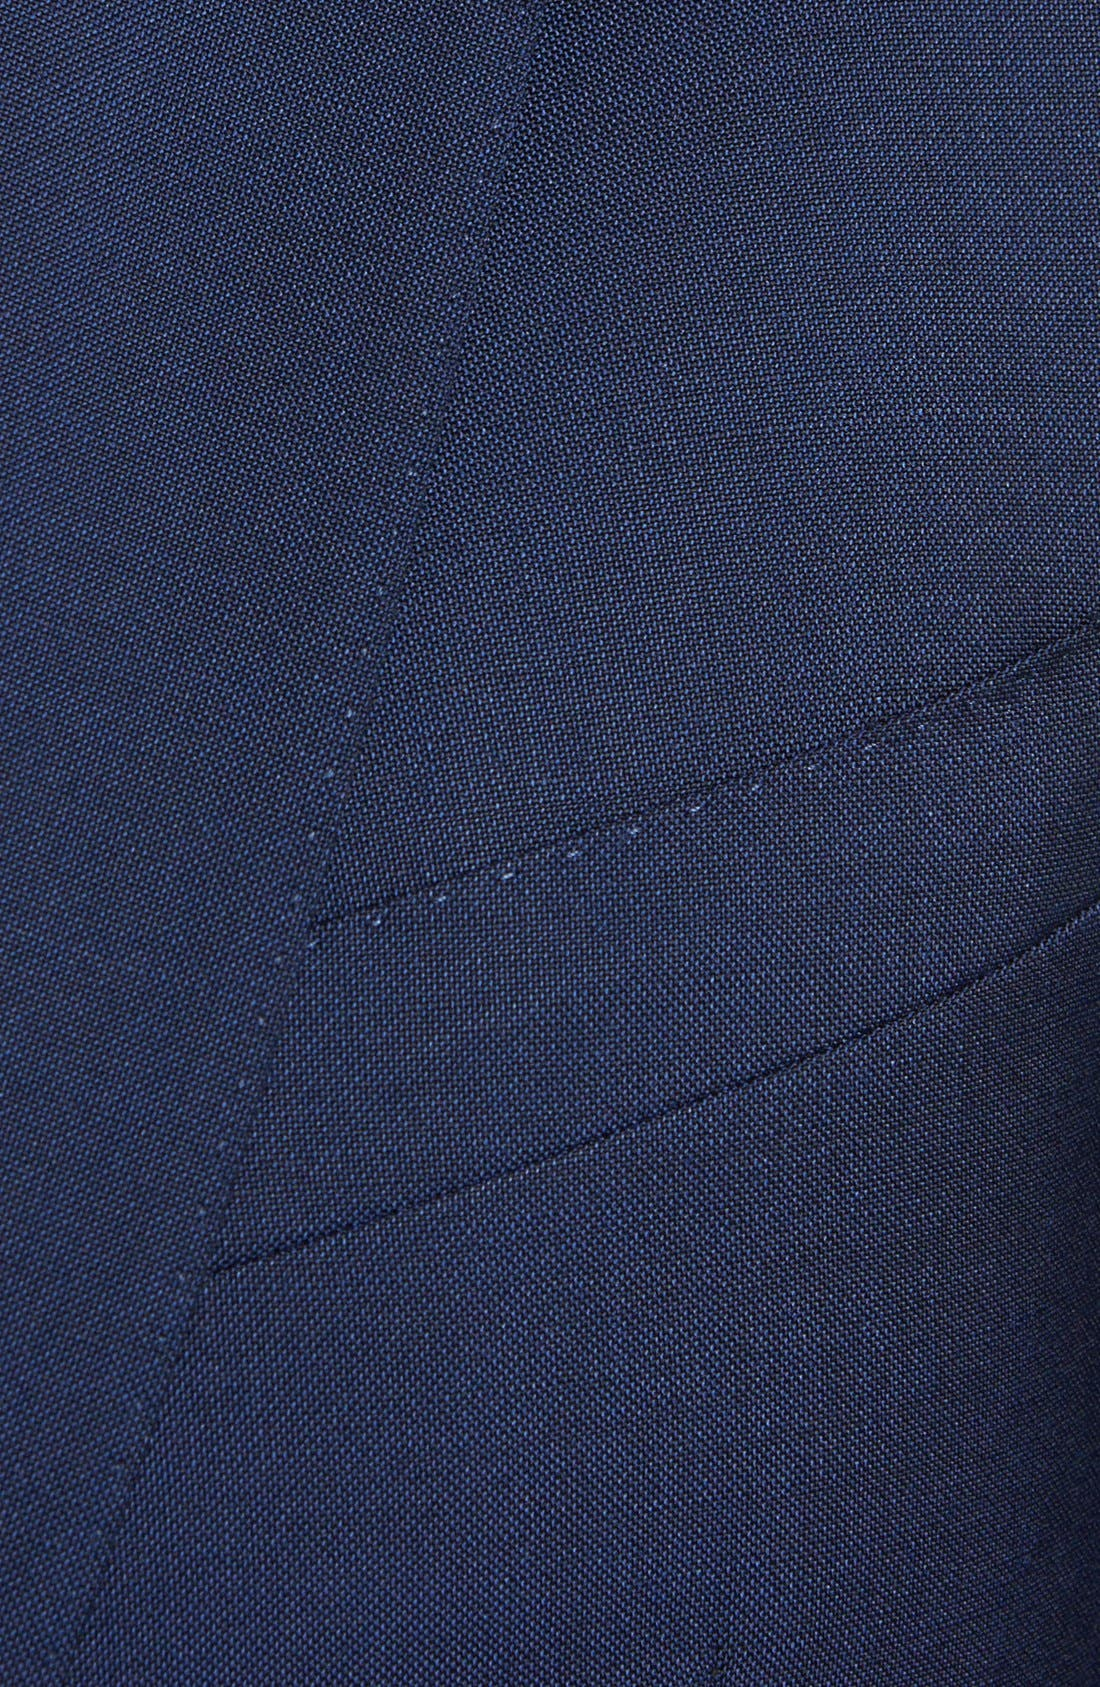 Alternate Image 3  - Burberry London Trim Fit Wool Blazer